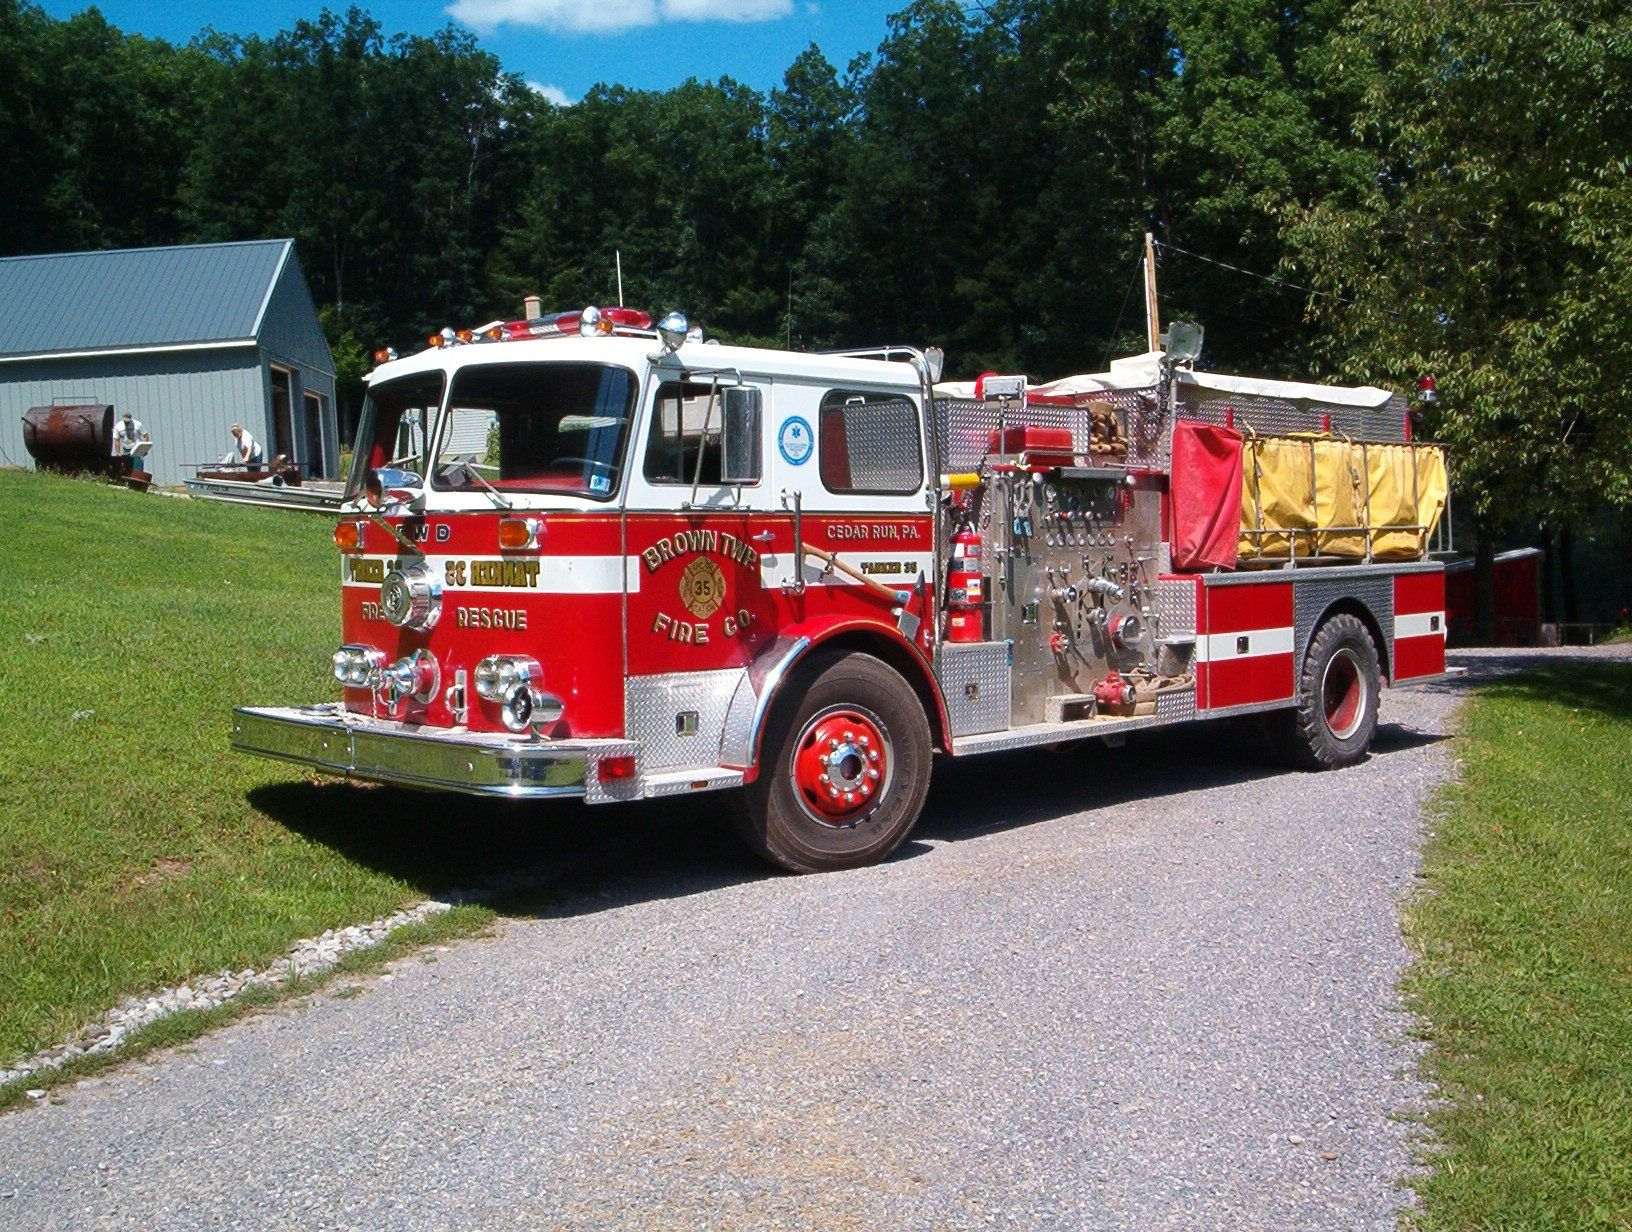 Pin By Bob On Fire Apparatus Fire Trucks Fire Rescue Fire